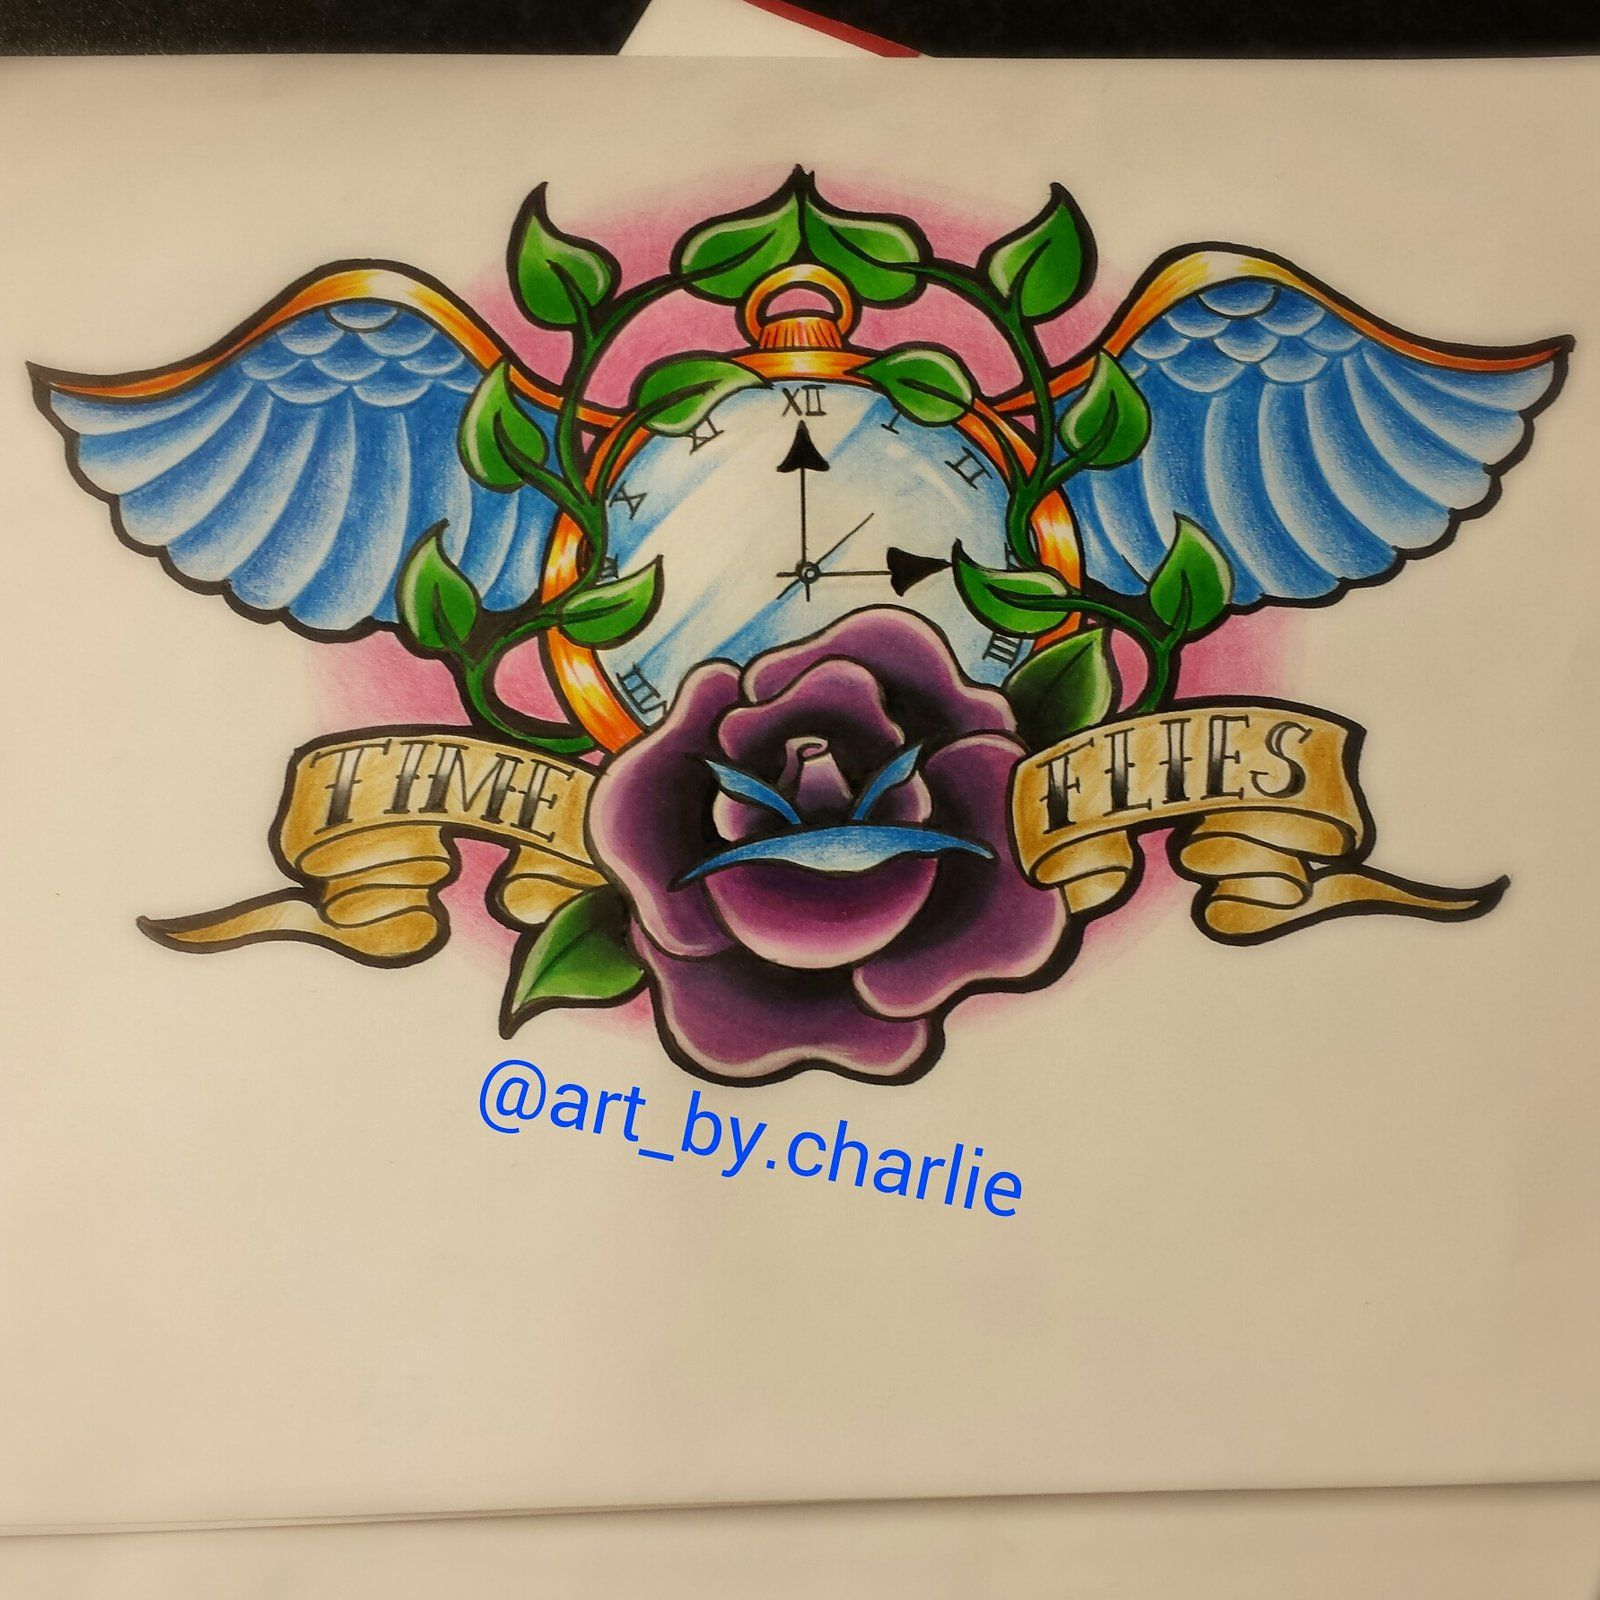 New school tattoo design - Time Piece New School Tattoo Design By Charlie Mcclenaghan Designs